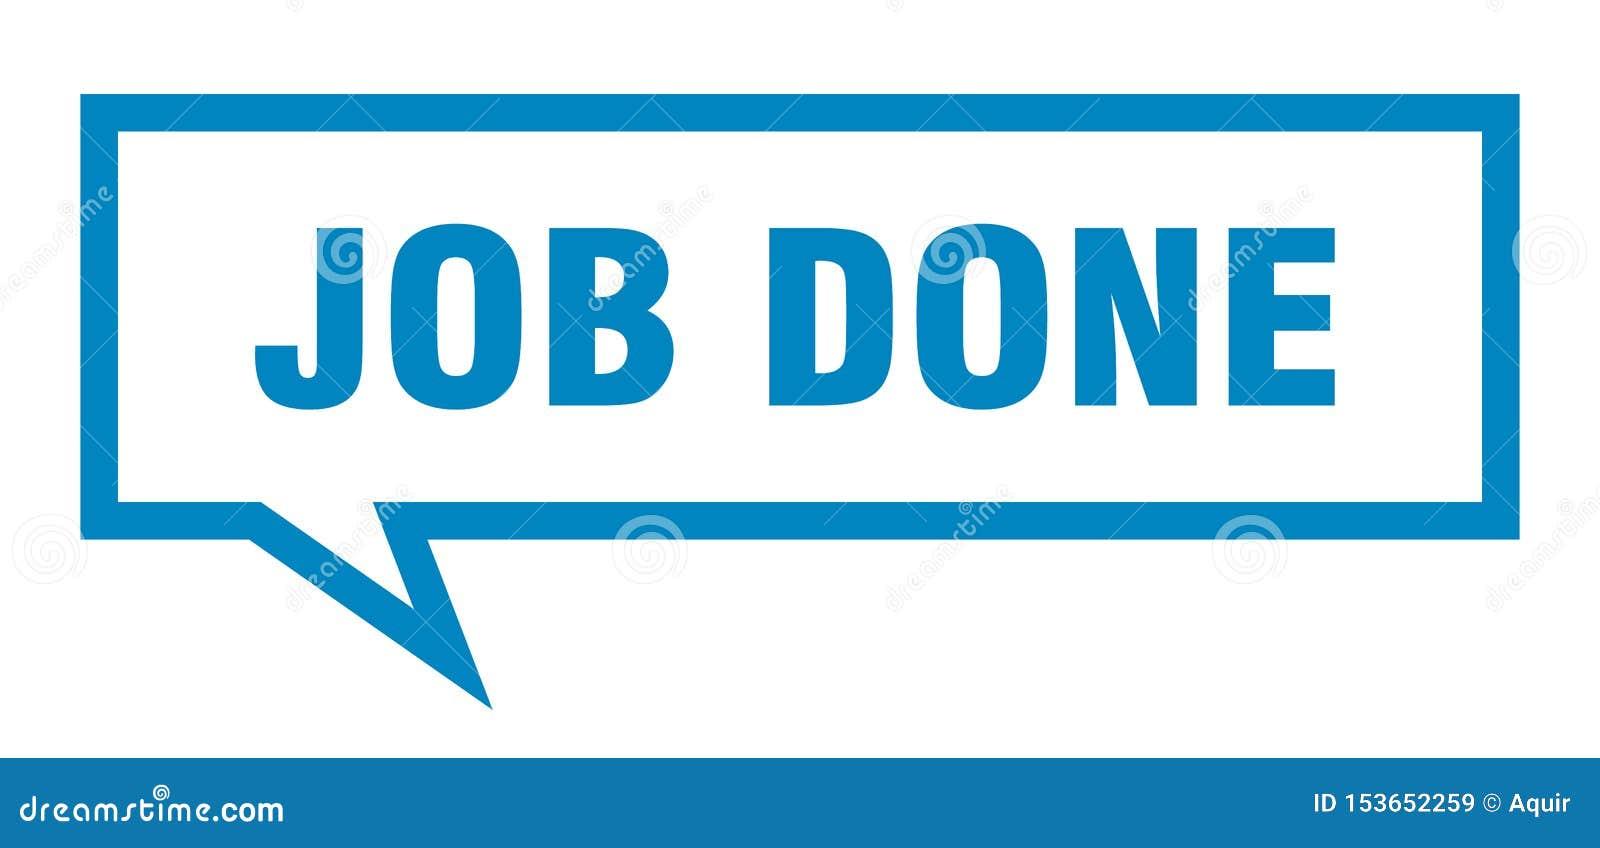 job done speech bubble.